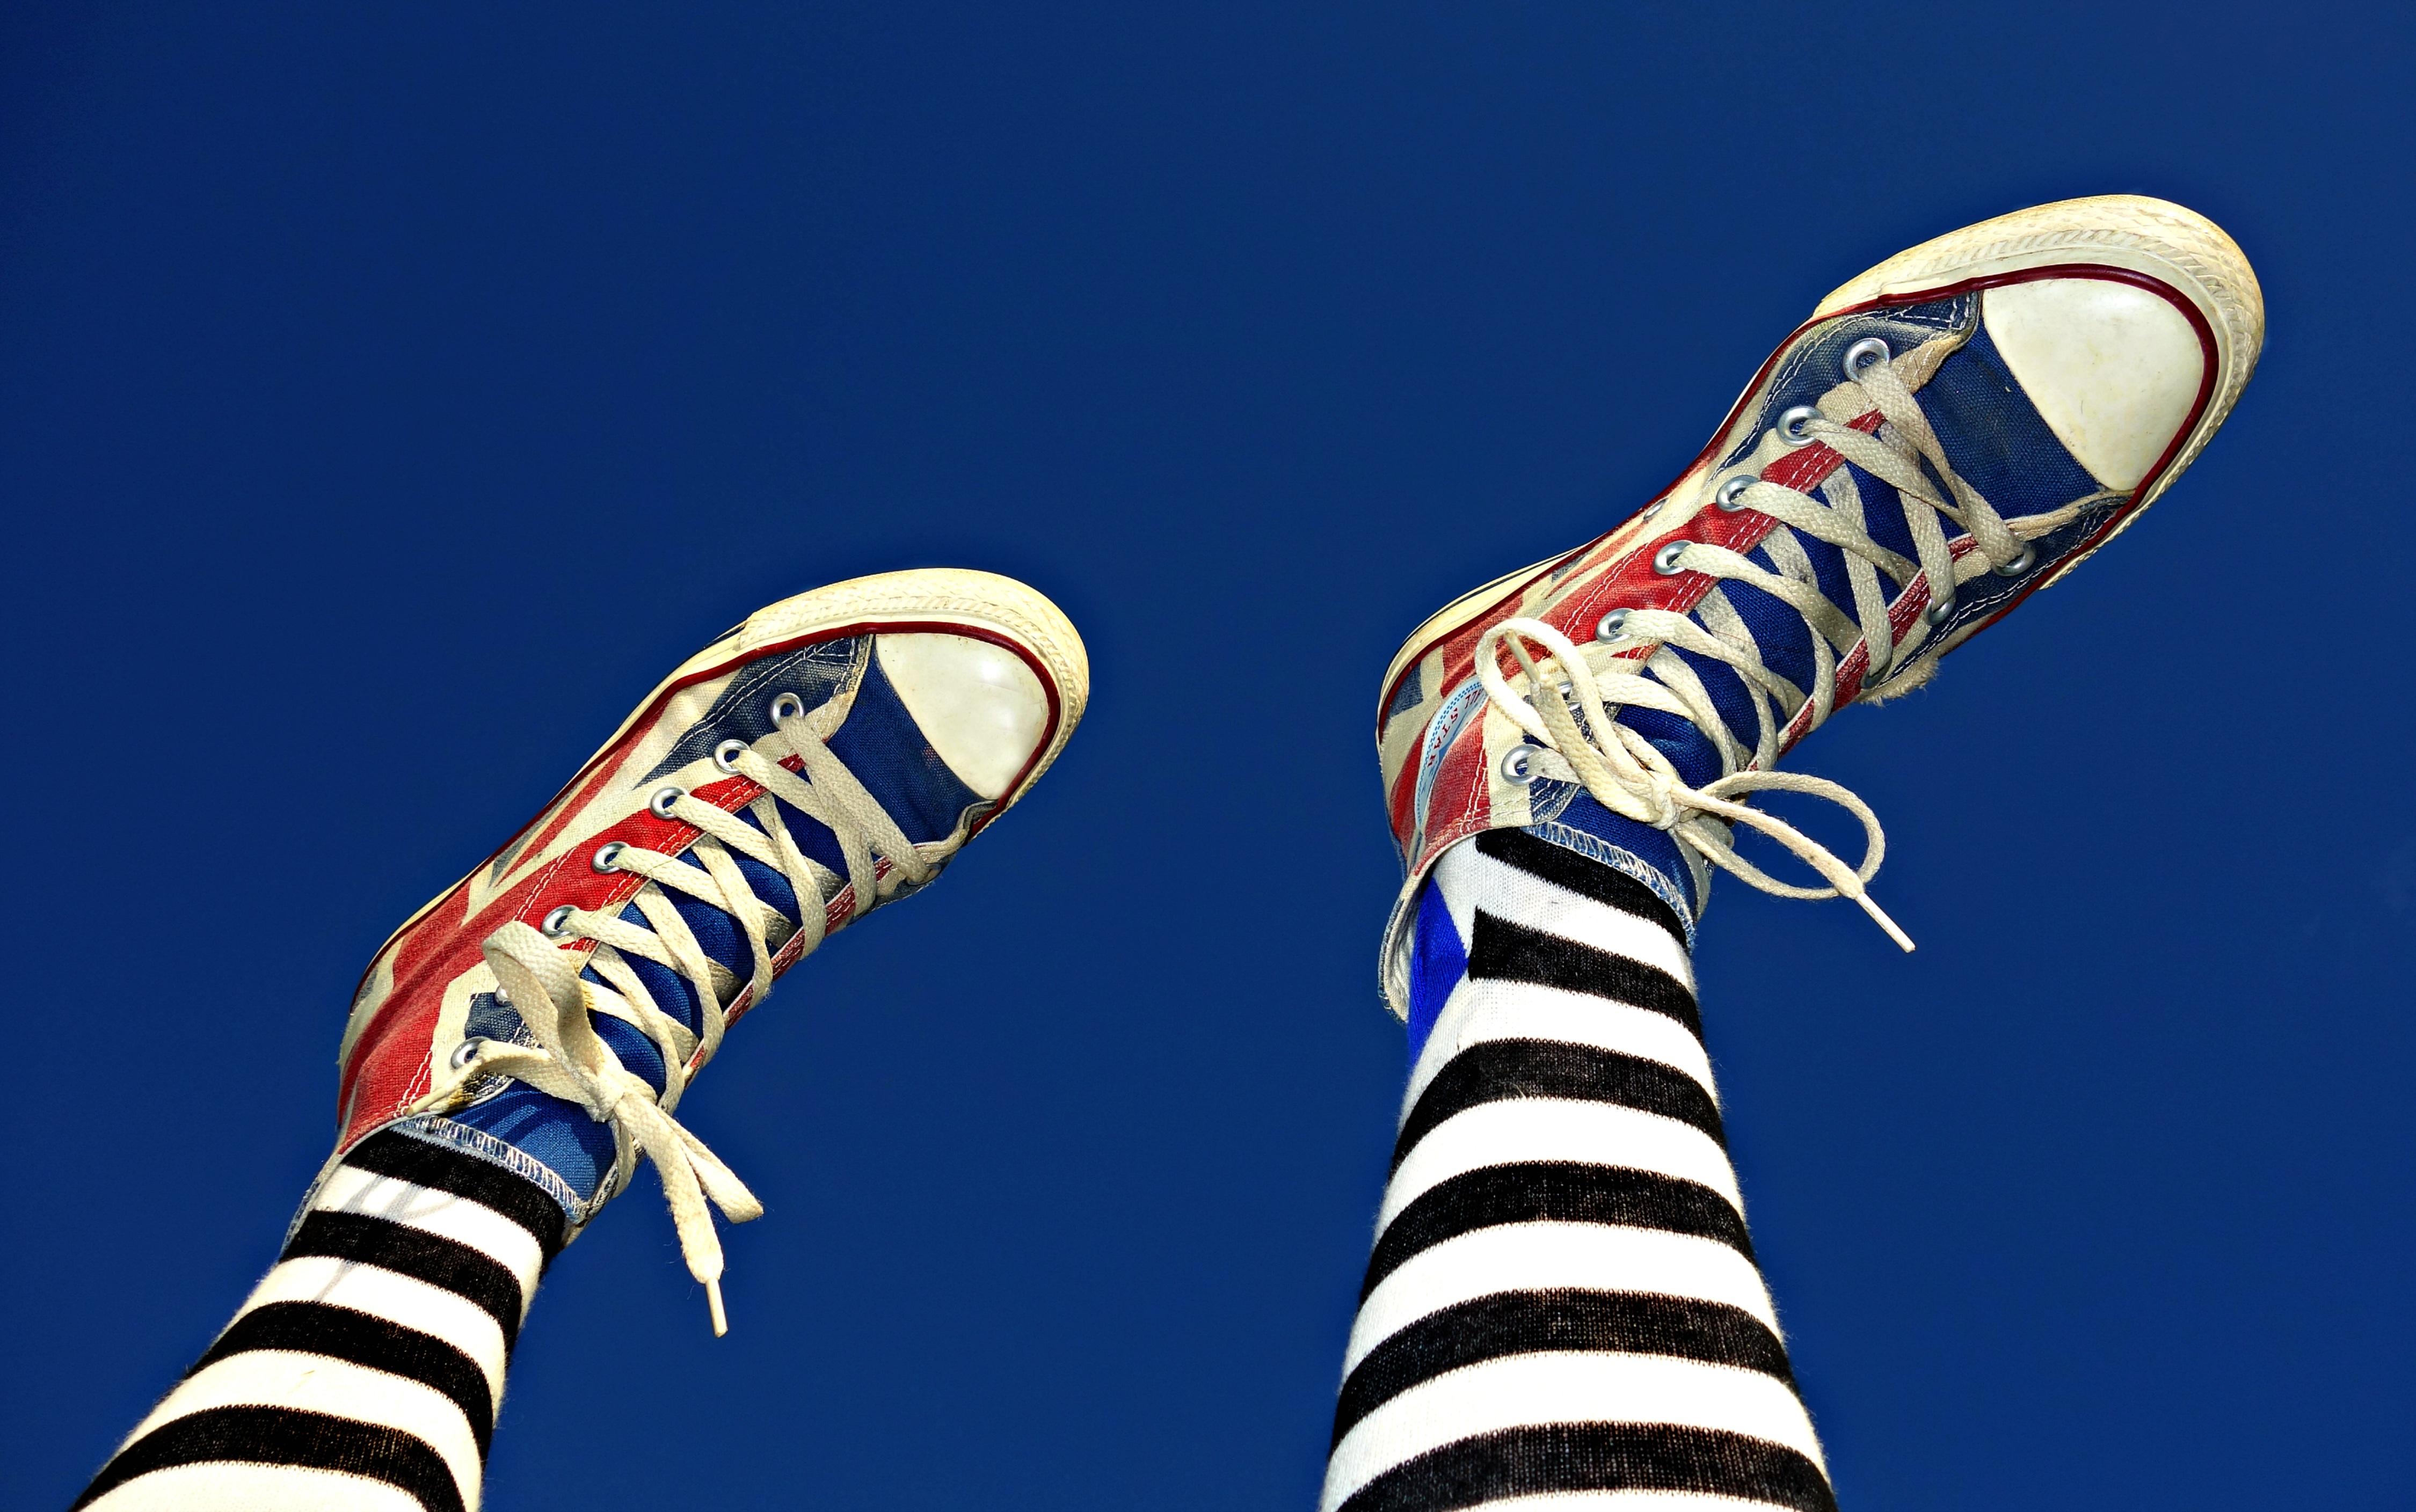 sepatu wanita mode mainan ilustrasi keren kaki sepatu kets garis garis alas kaki a celana